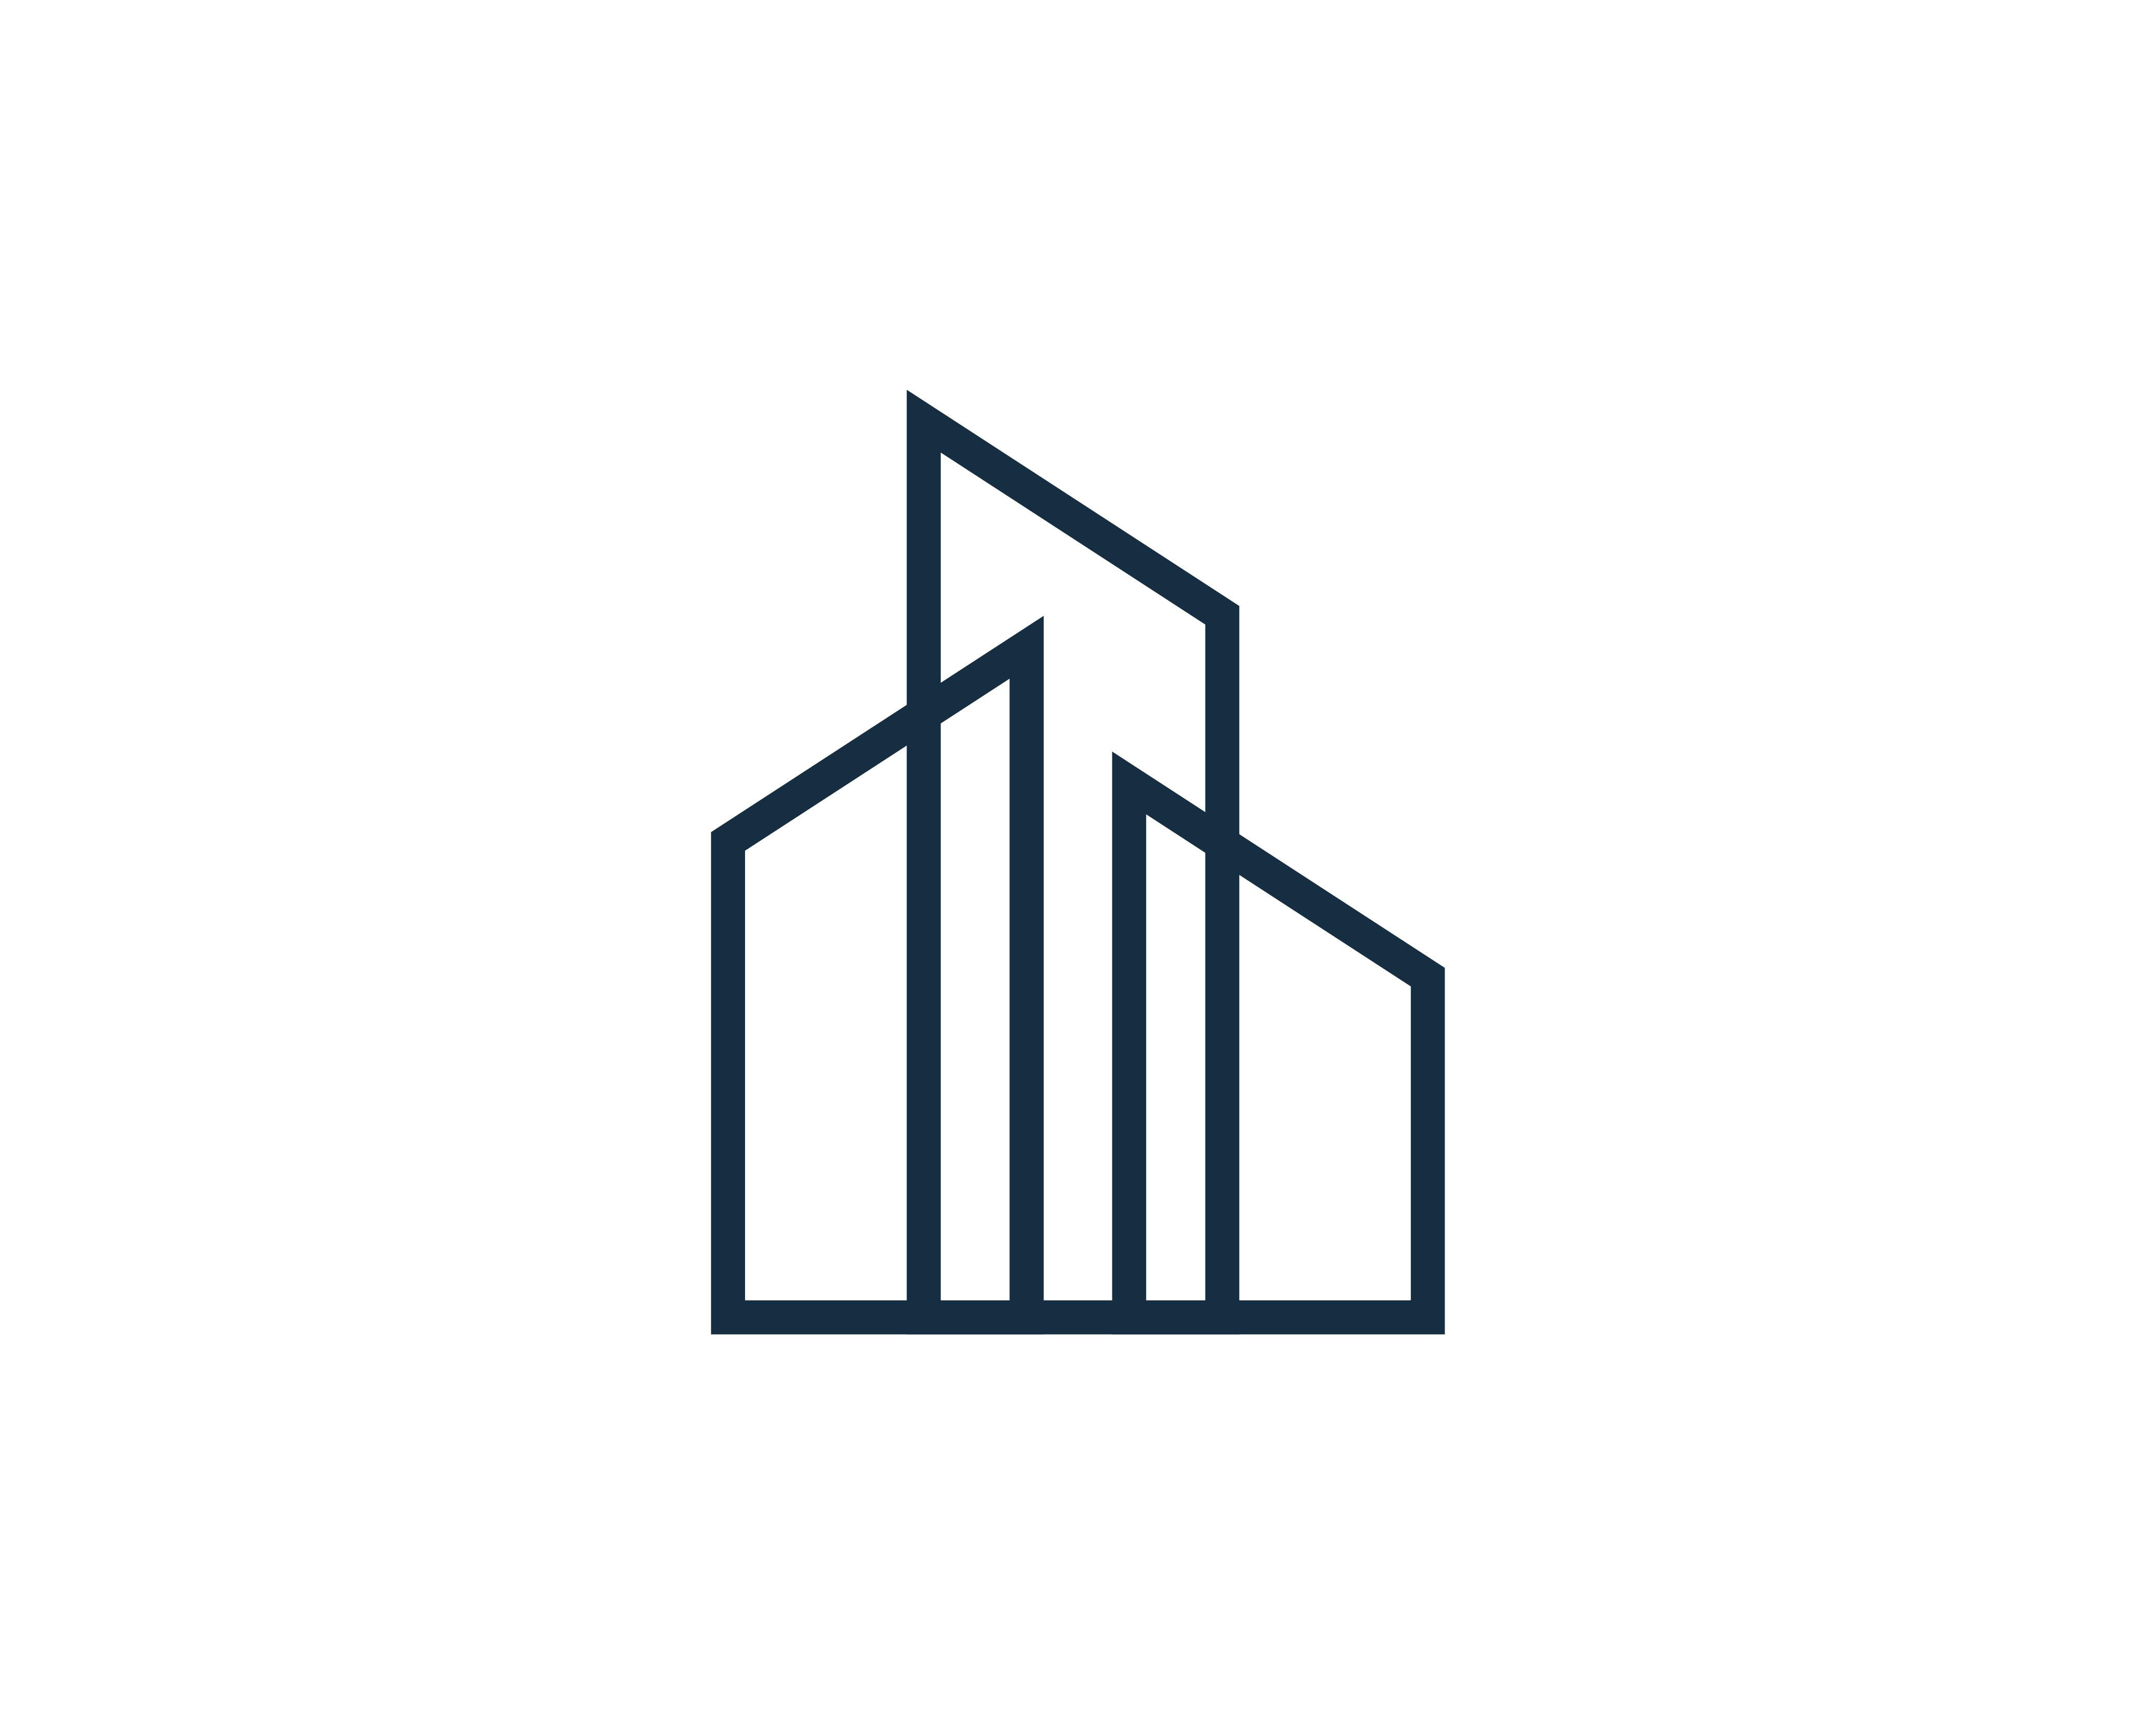 Real Estate Building Logo Icon Vector - Download Free Vectors, Clipart Graphics & Vector Art